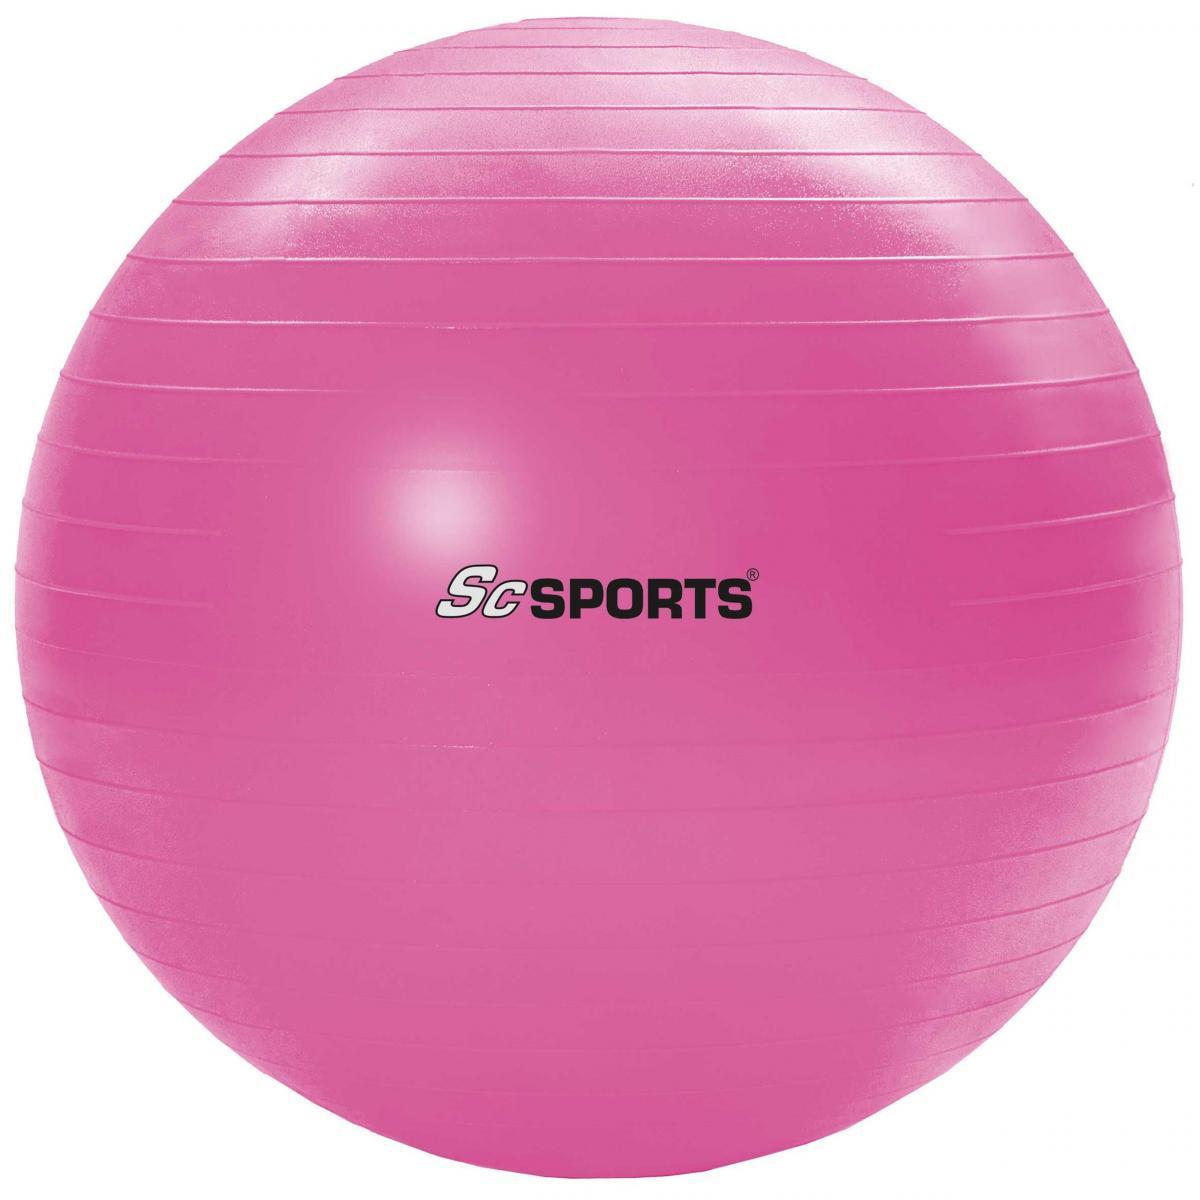 ScSPORTS Gymnastikball pink 65 cm SC-100396-358